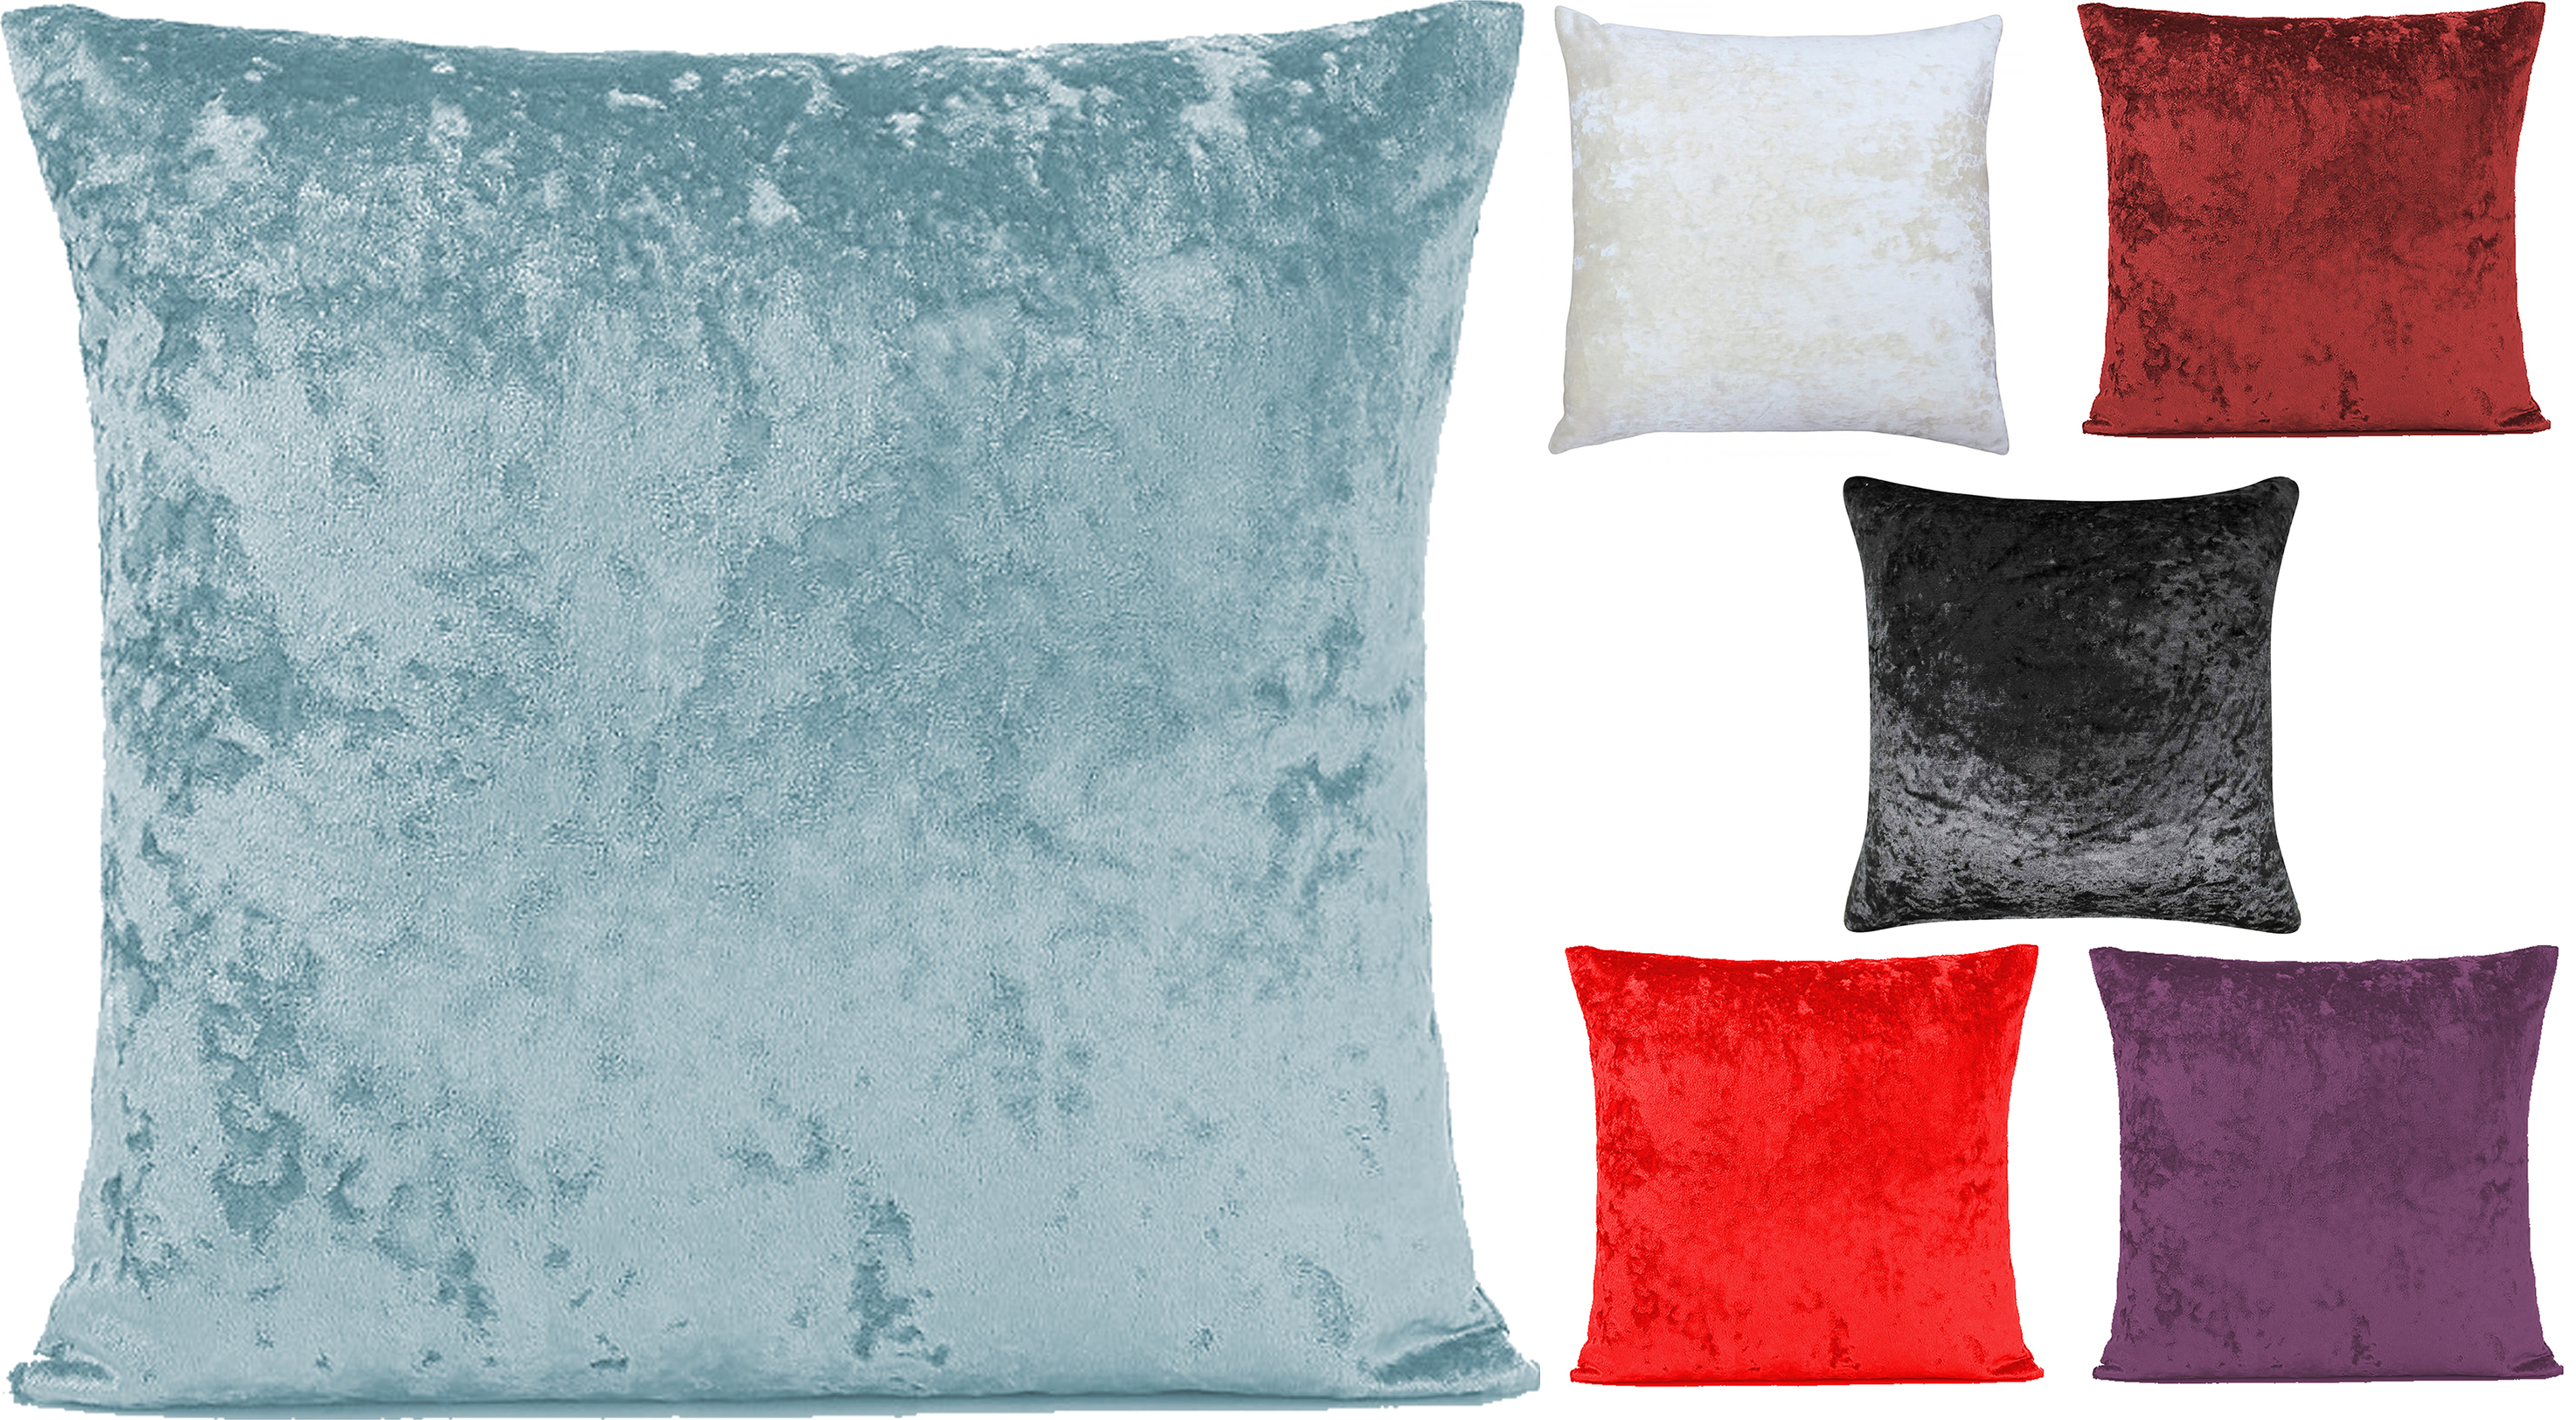 Crushed Velvet Cushion Cover Plain Luxury Soft Covers 45x45cm Ebay